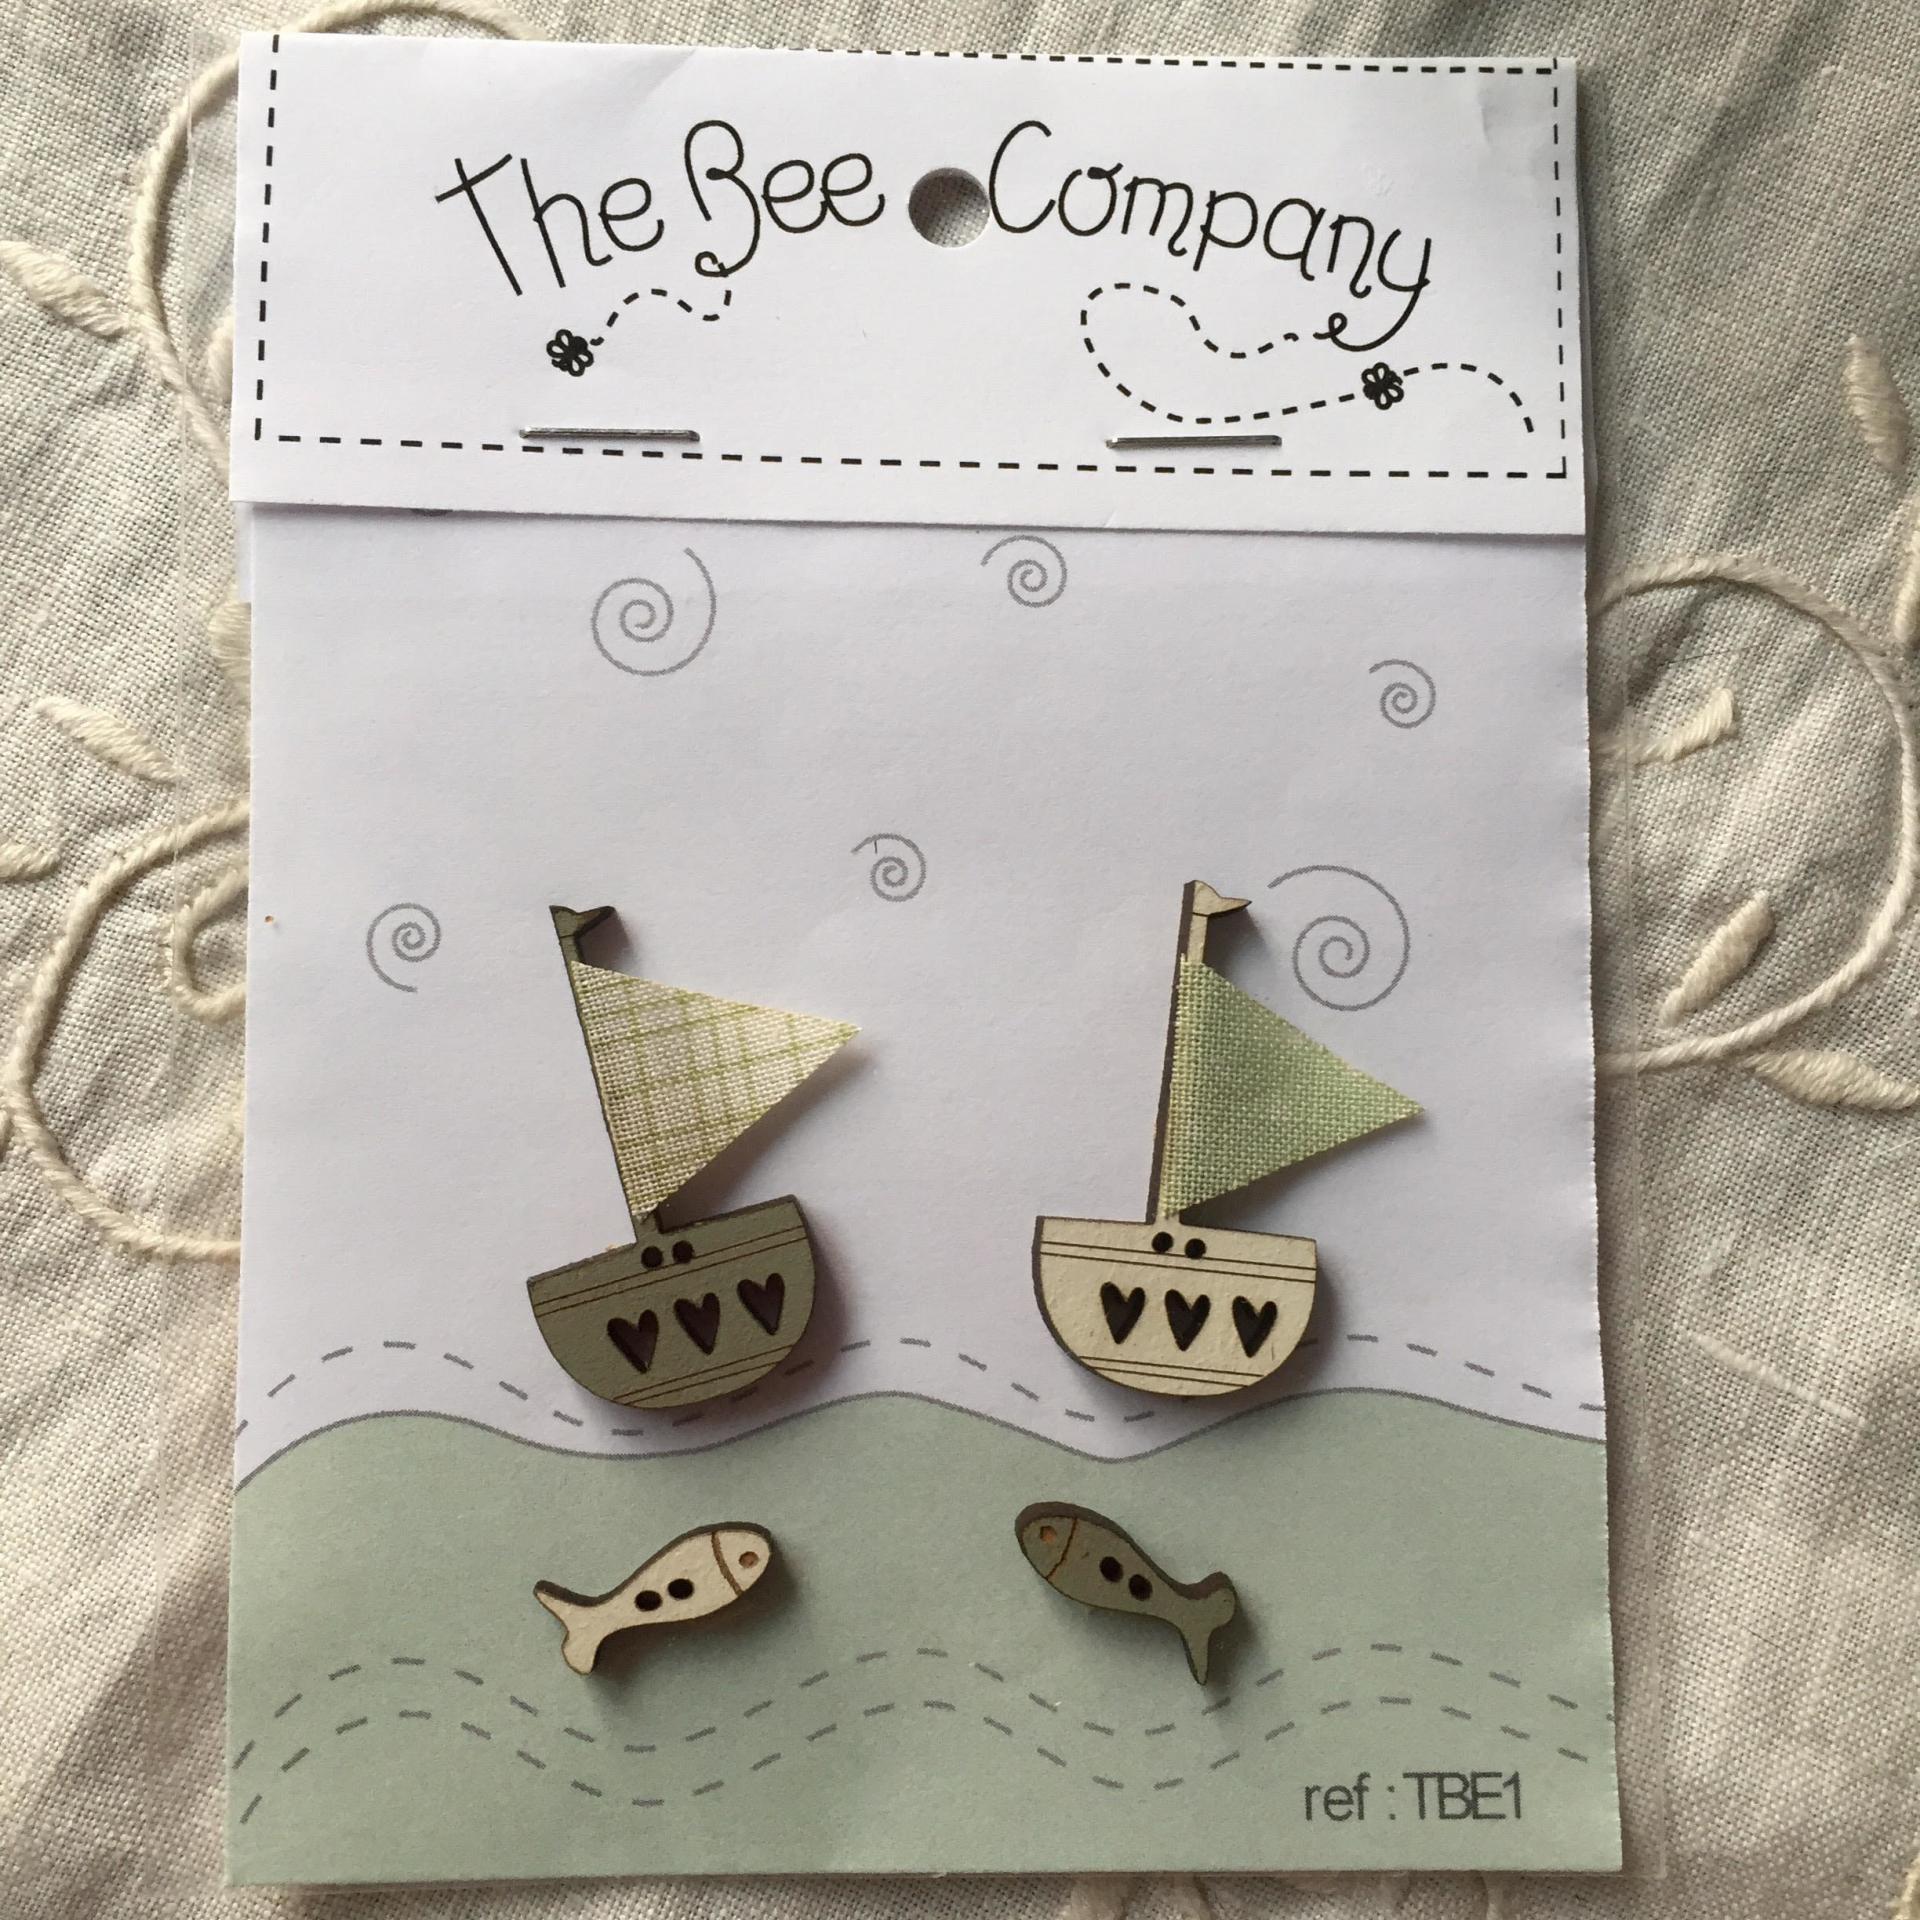 Tbe1 bateau